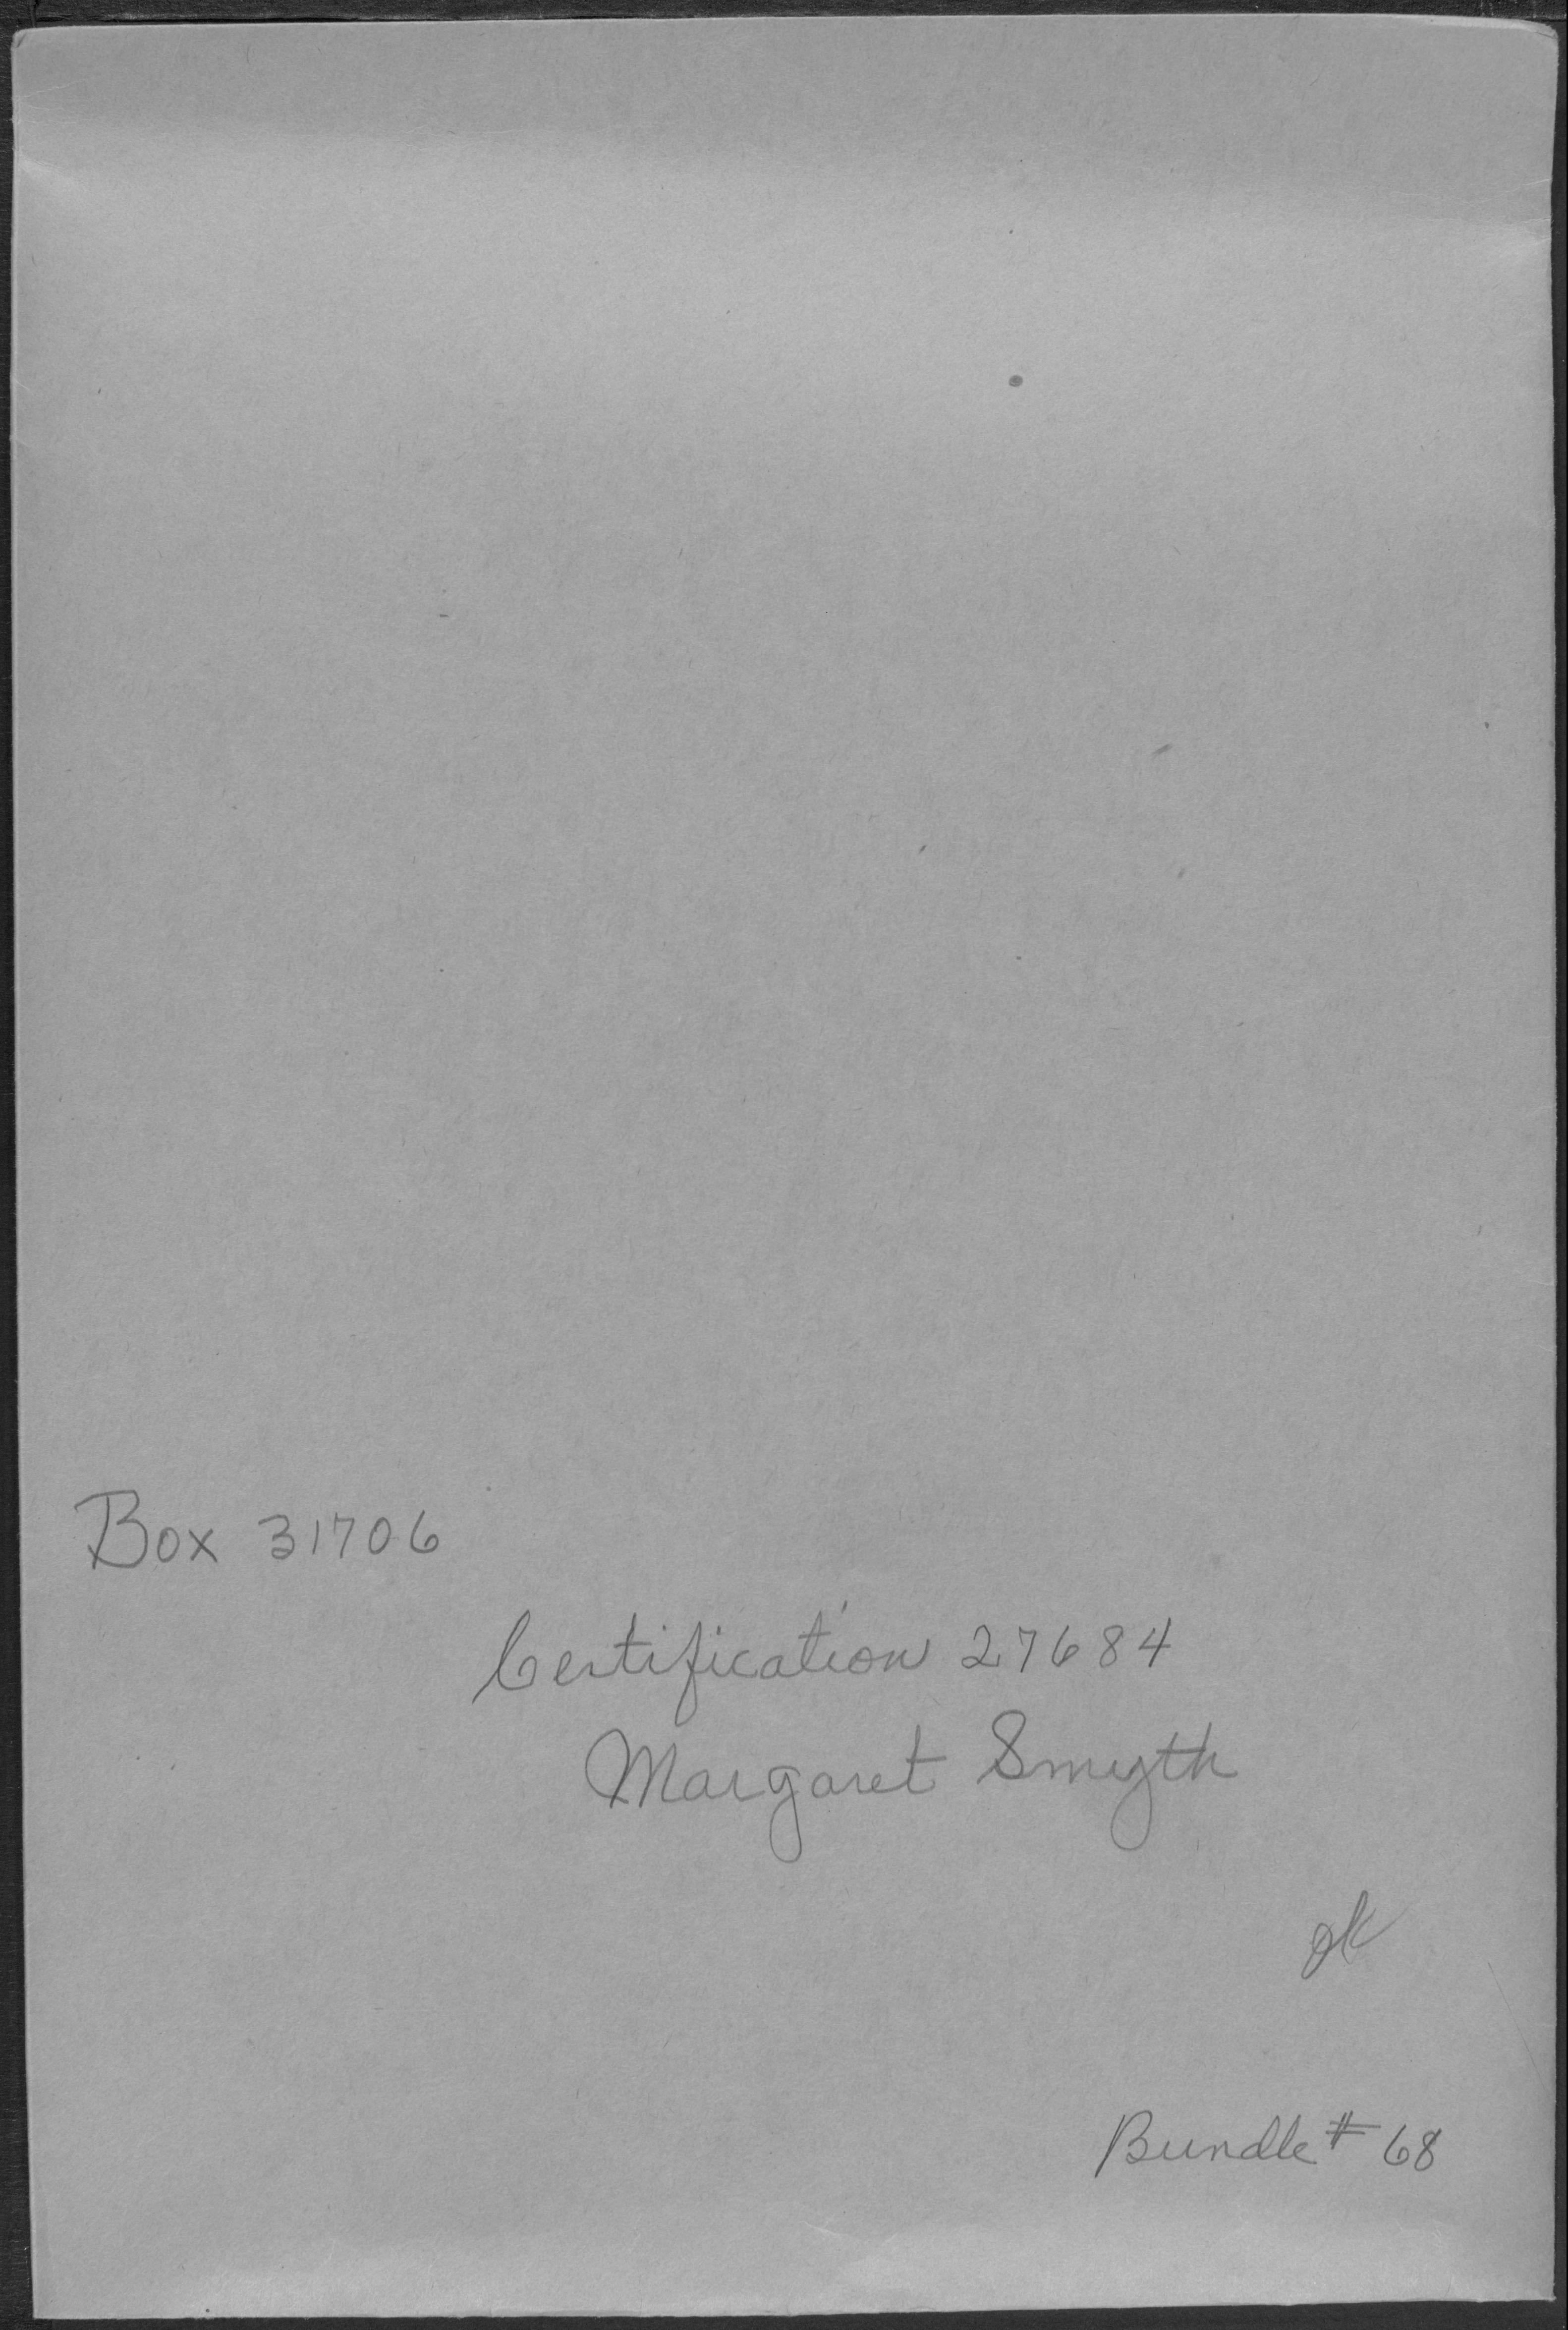 Approved Pension Application File for Margaret Harrison Smyth, Widow of George F Smyth, Company I, 3rd Rhode Island Artillery Regiment (Application No. WC27684)